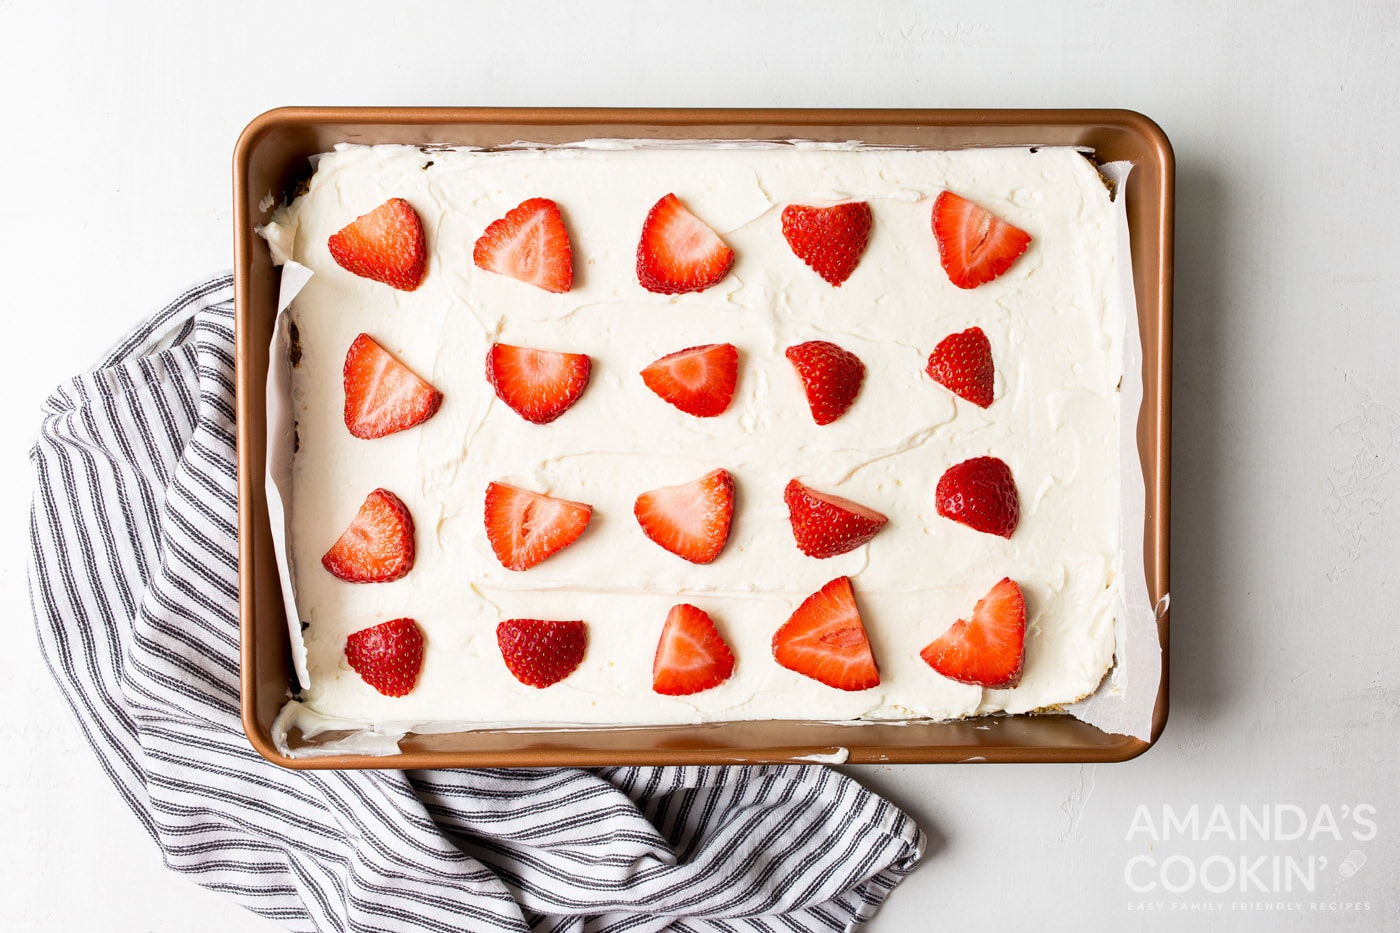 sliced strawberries on top of no bake cheesecake bars